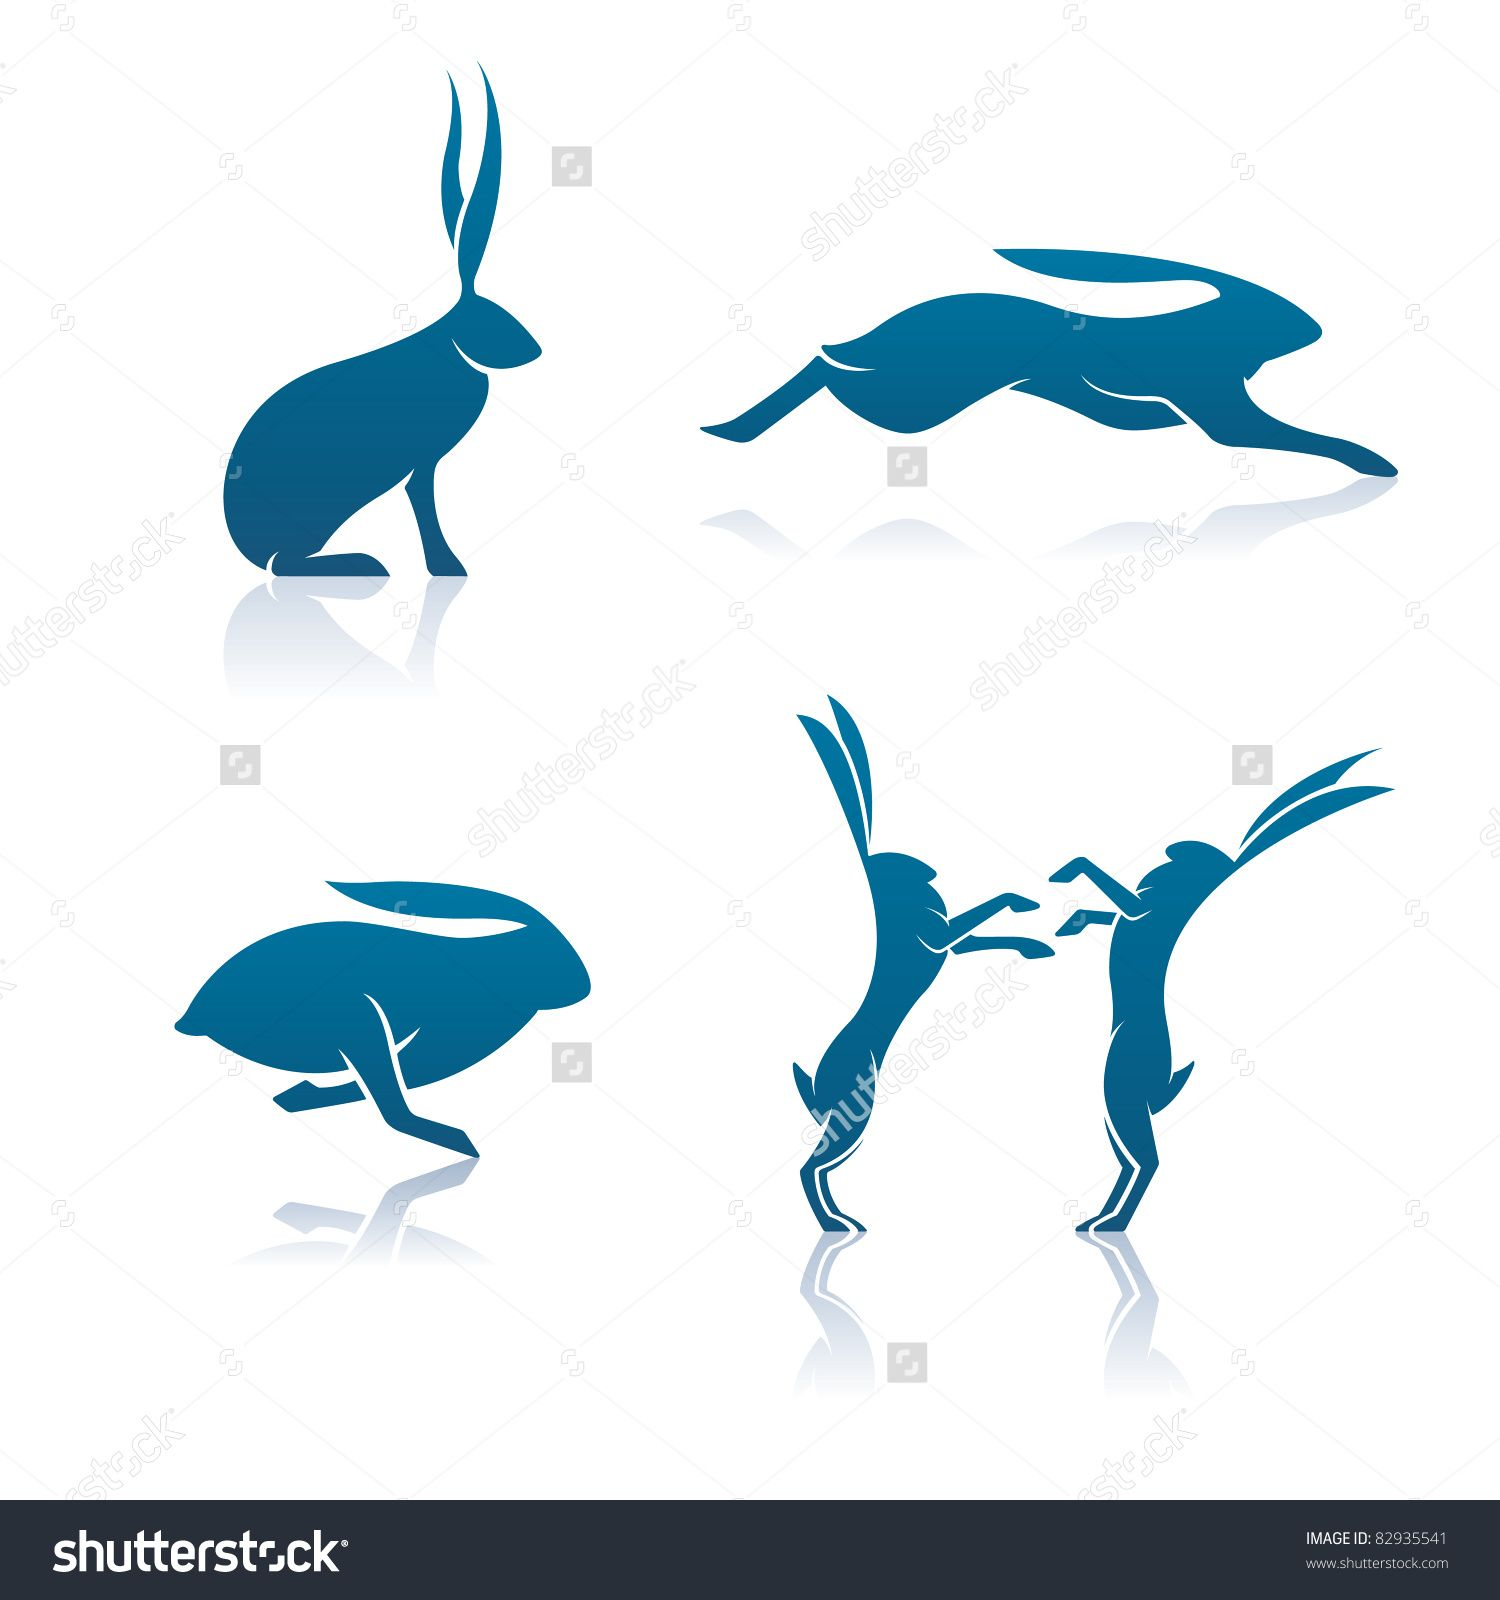 1500x1600 Hare Stock Vectors Amp Vector Clip Art Shutterstock Hare